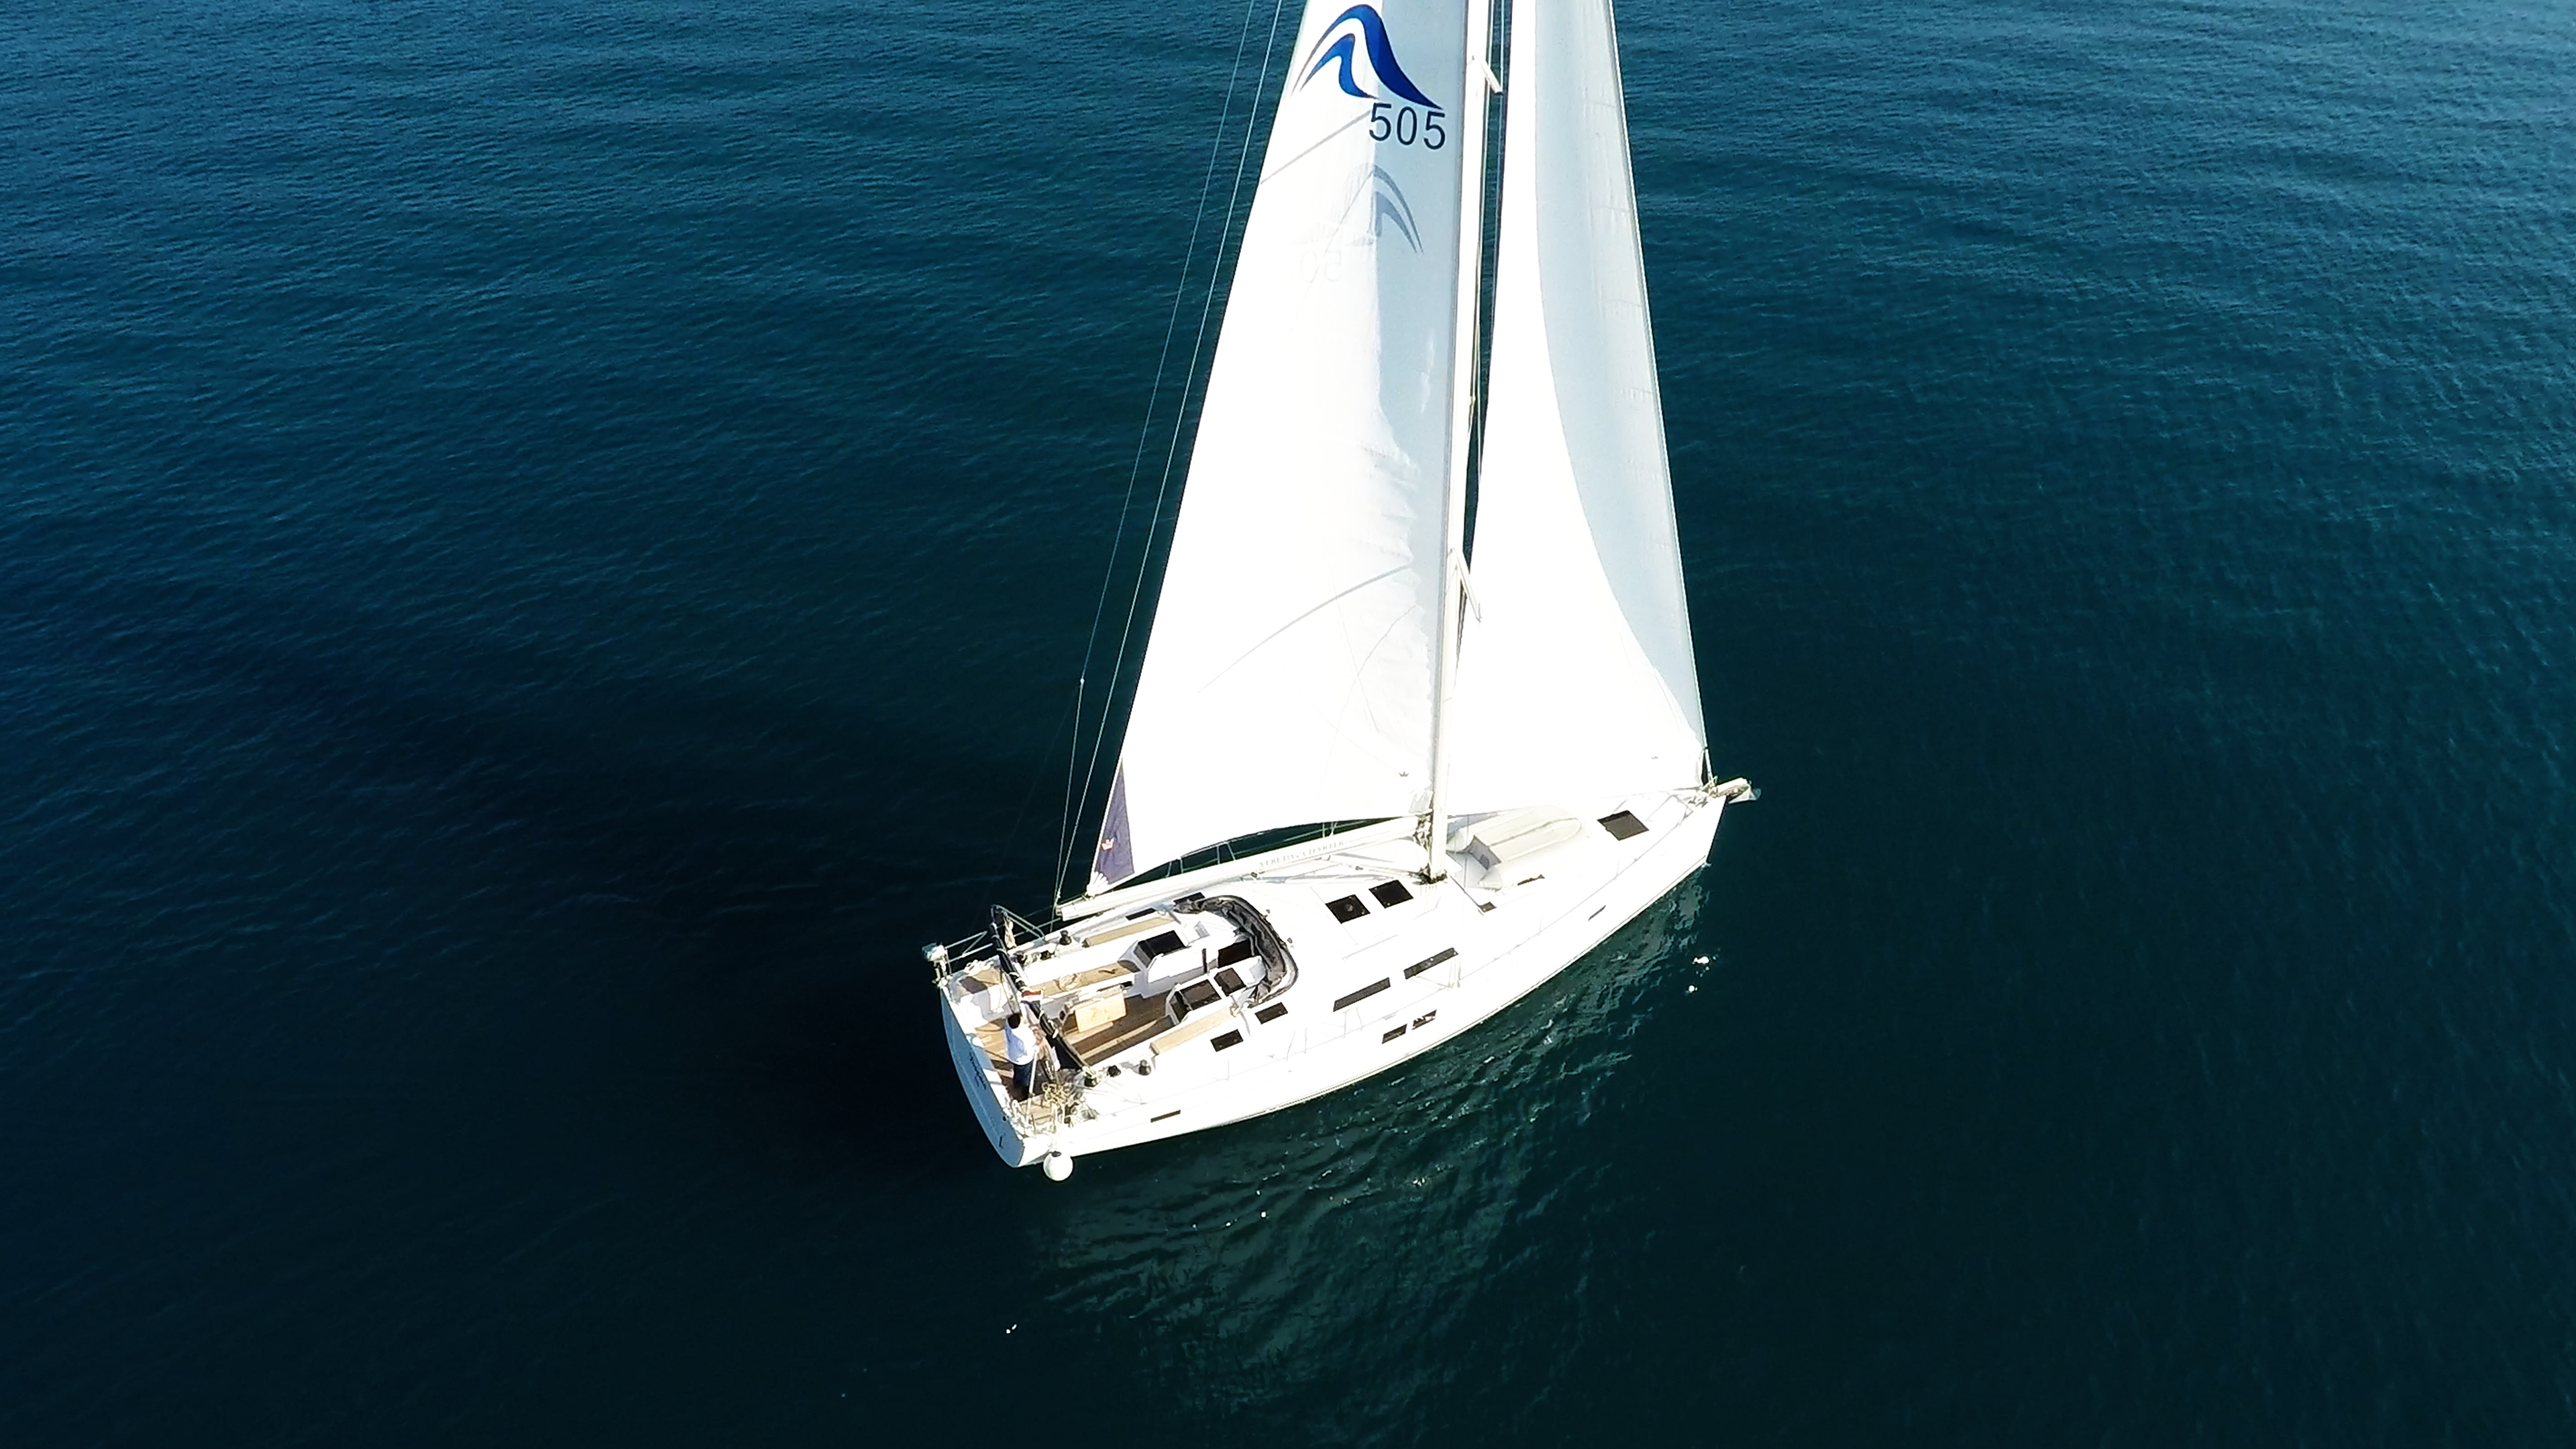 Segelyacht Hanse 505 Segelboot 1